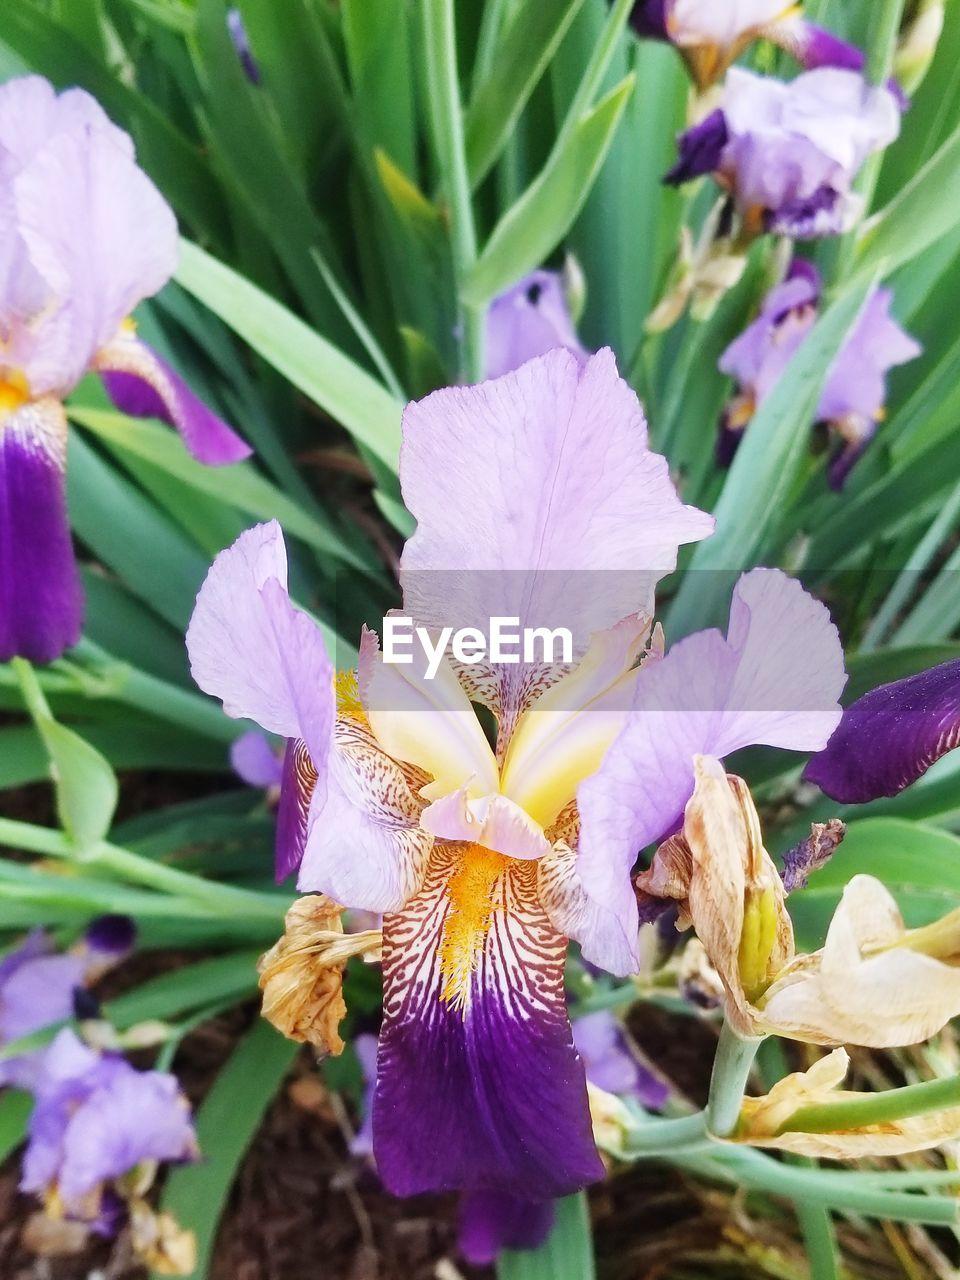 CLOSE-UP OF FRESH PURPLE IRIS FLOWERS ON PLANT